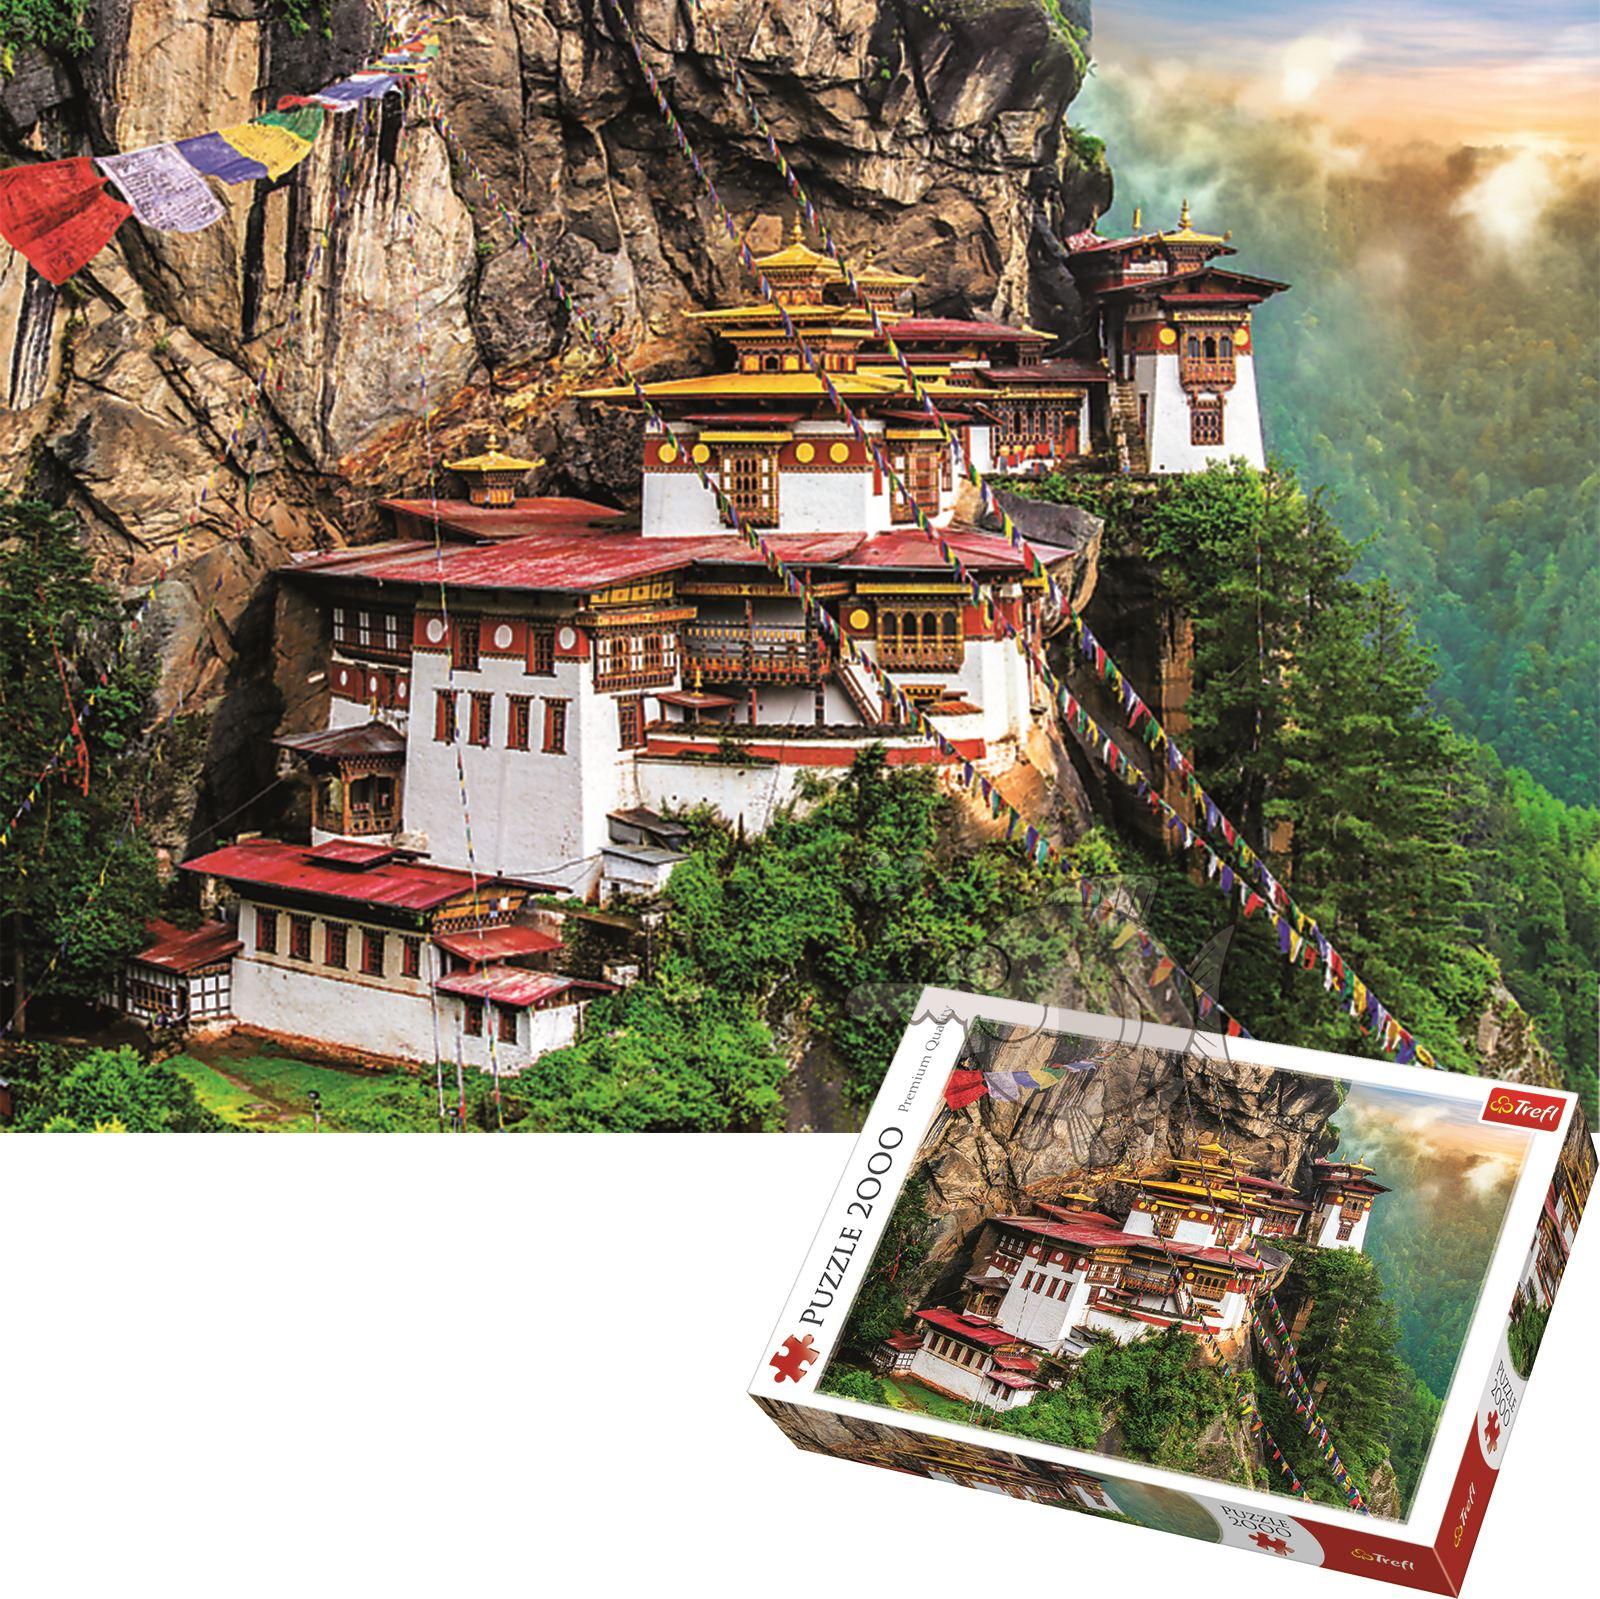 Trefl-300-500-1000-1500-2000-3000-4000-6000-Piece-Jigsaw-Puzzle-Landscapes-City thumbnail 416